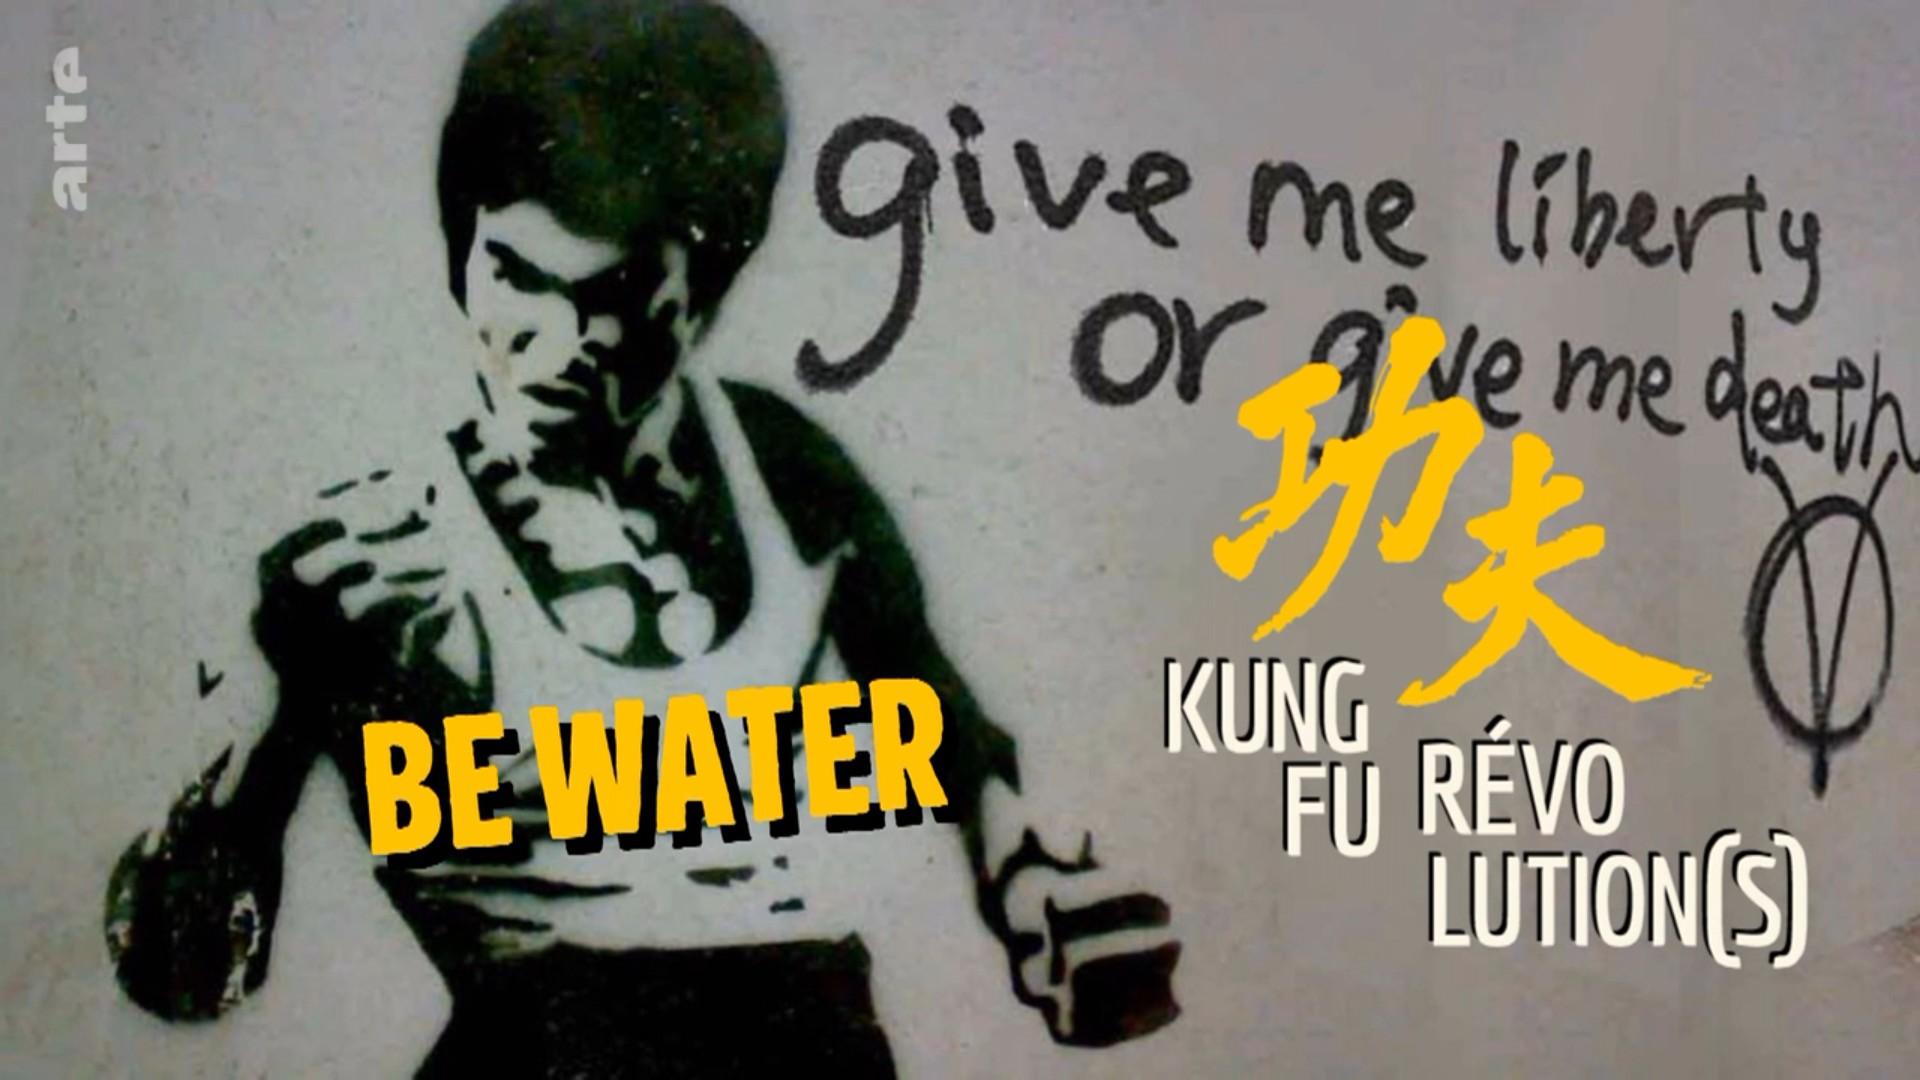 Arte (2) Kung-Fu Révolution